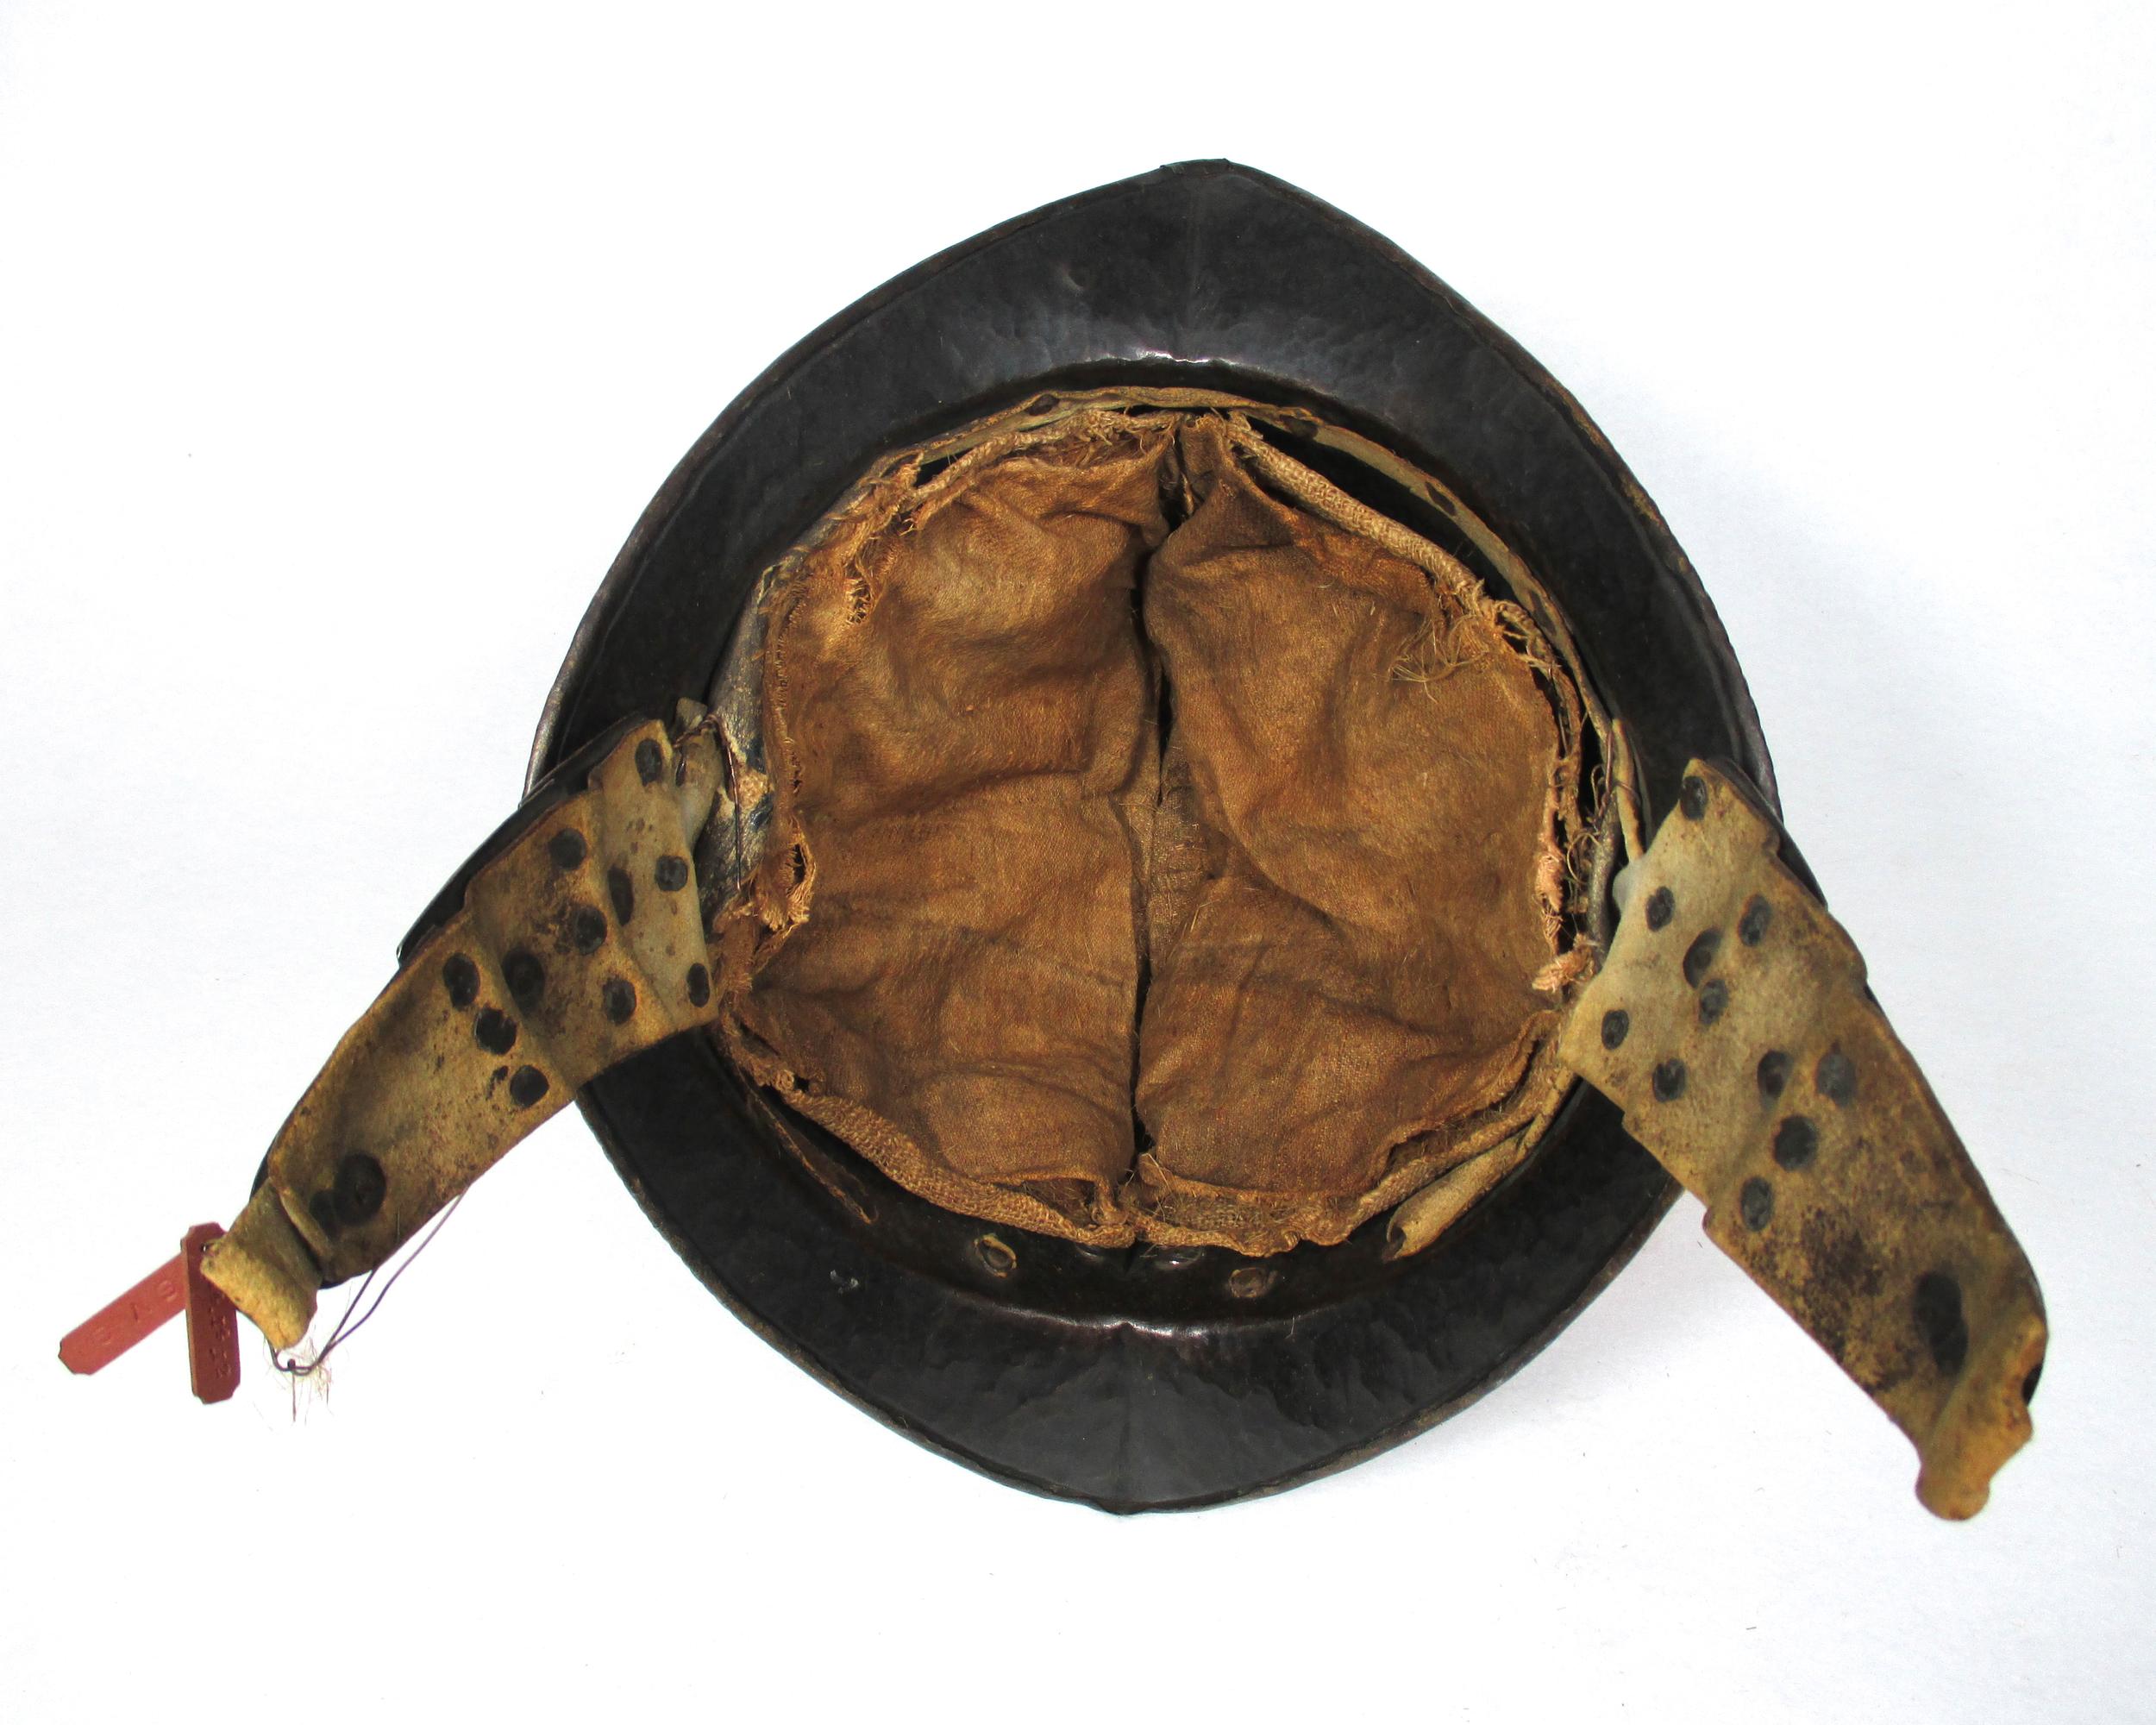 saxon-electoral-guard-comb-morion-late16th-century-helmet-nuremburg-german-gary-friedland-arms-armor2.jpg